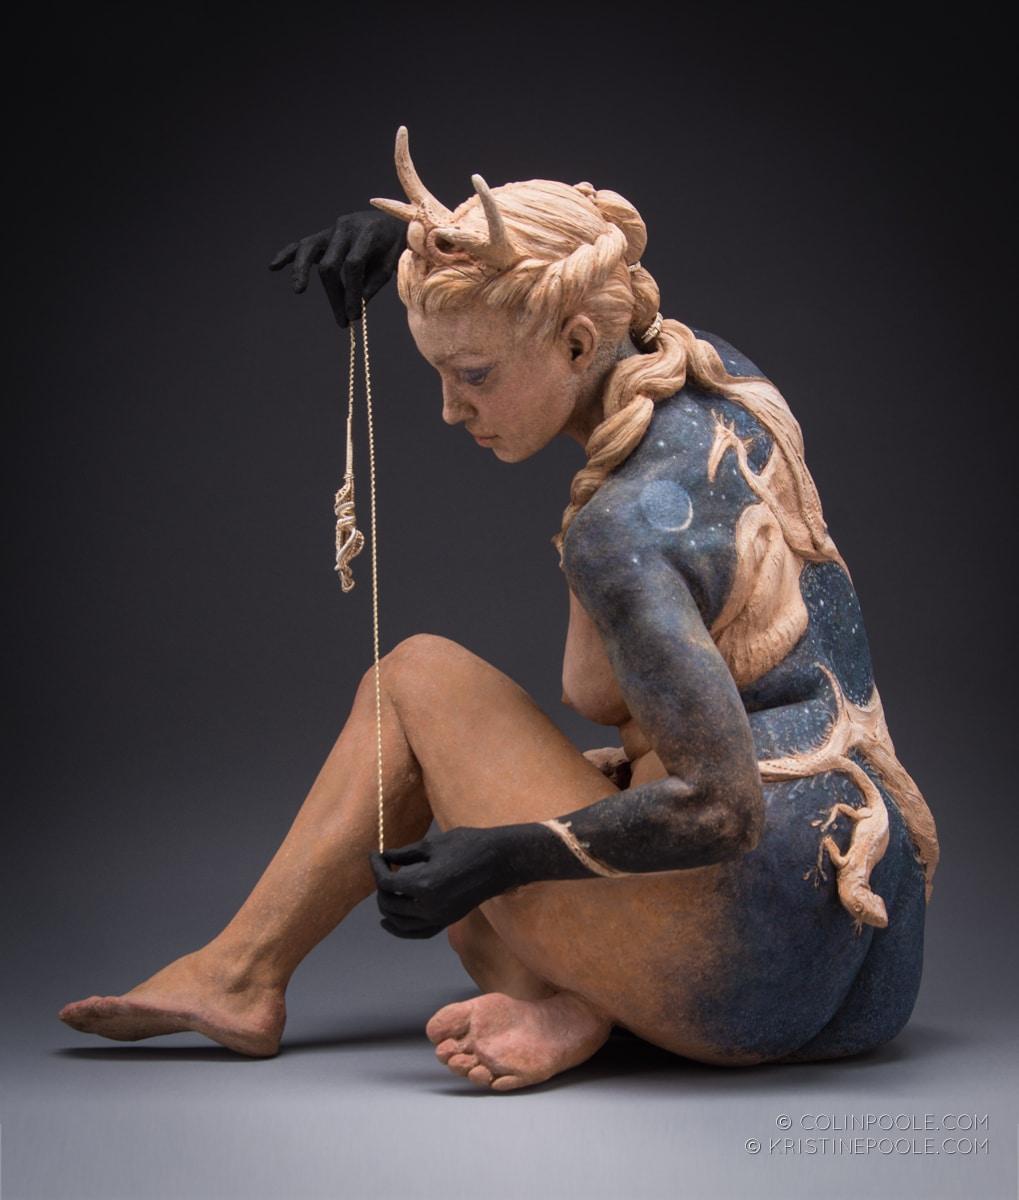 Beautiful-Bizarre-Art-Prize-Kristine-and-Colin-Poole.jpg